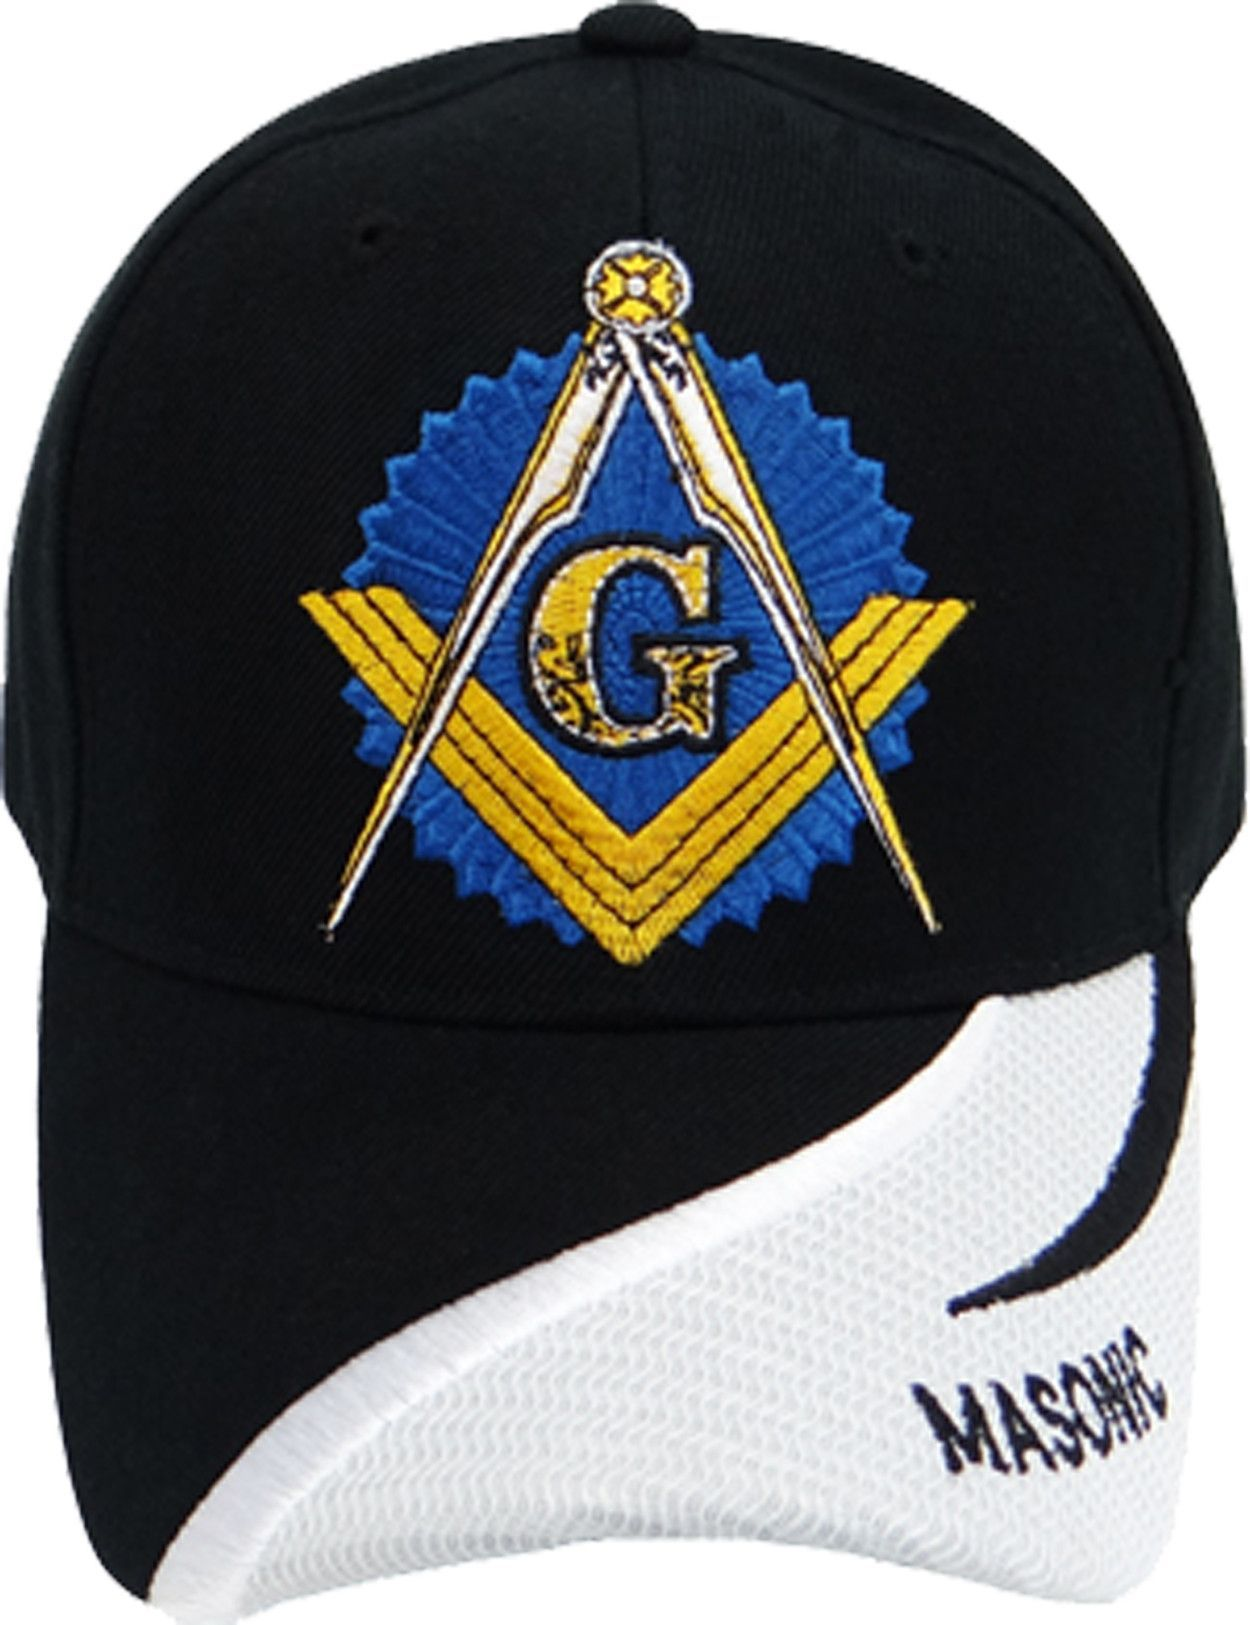 930f44c099d84 Mason Hat Black and White Baseball Cap with Master Masonic Logo Freemasons  Shriners Prince Hall Lodge Headwear